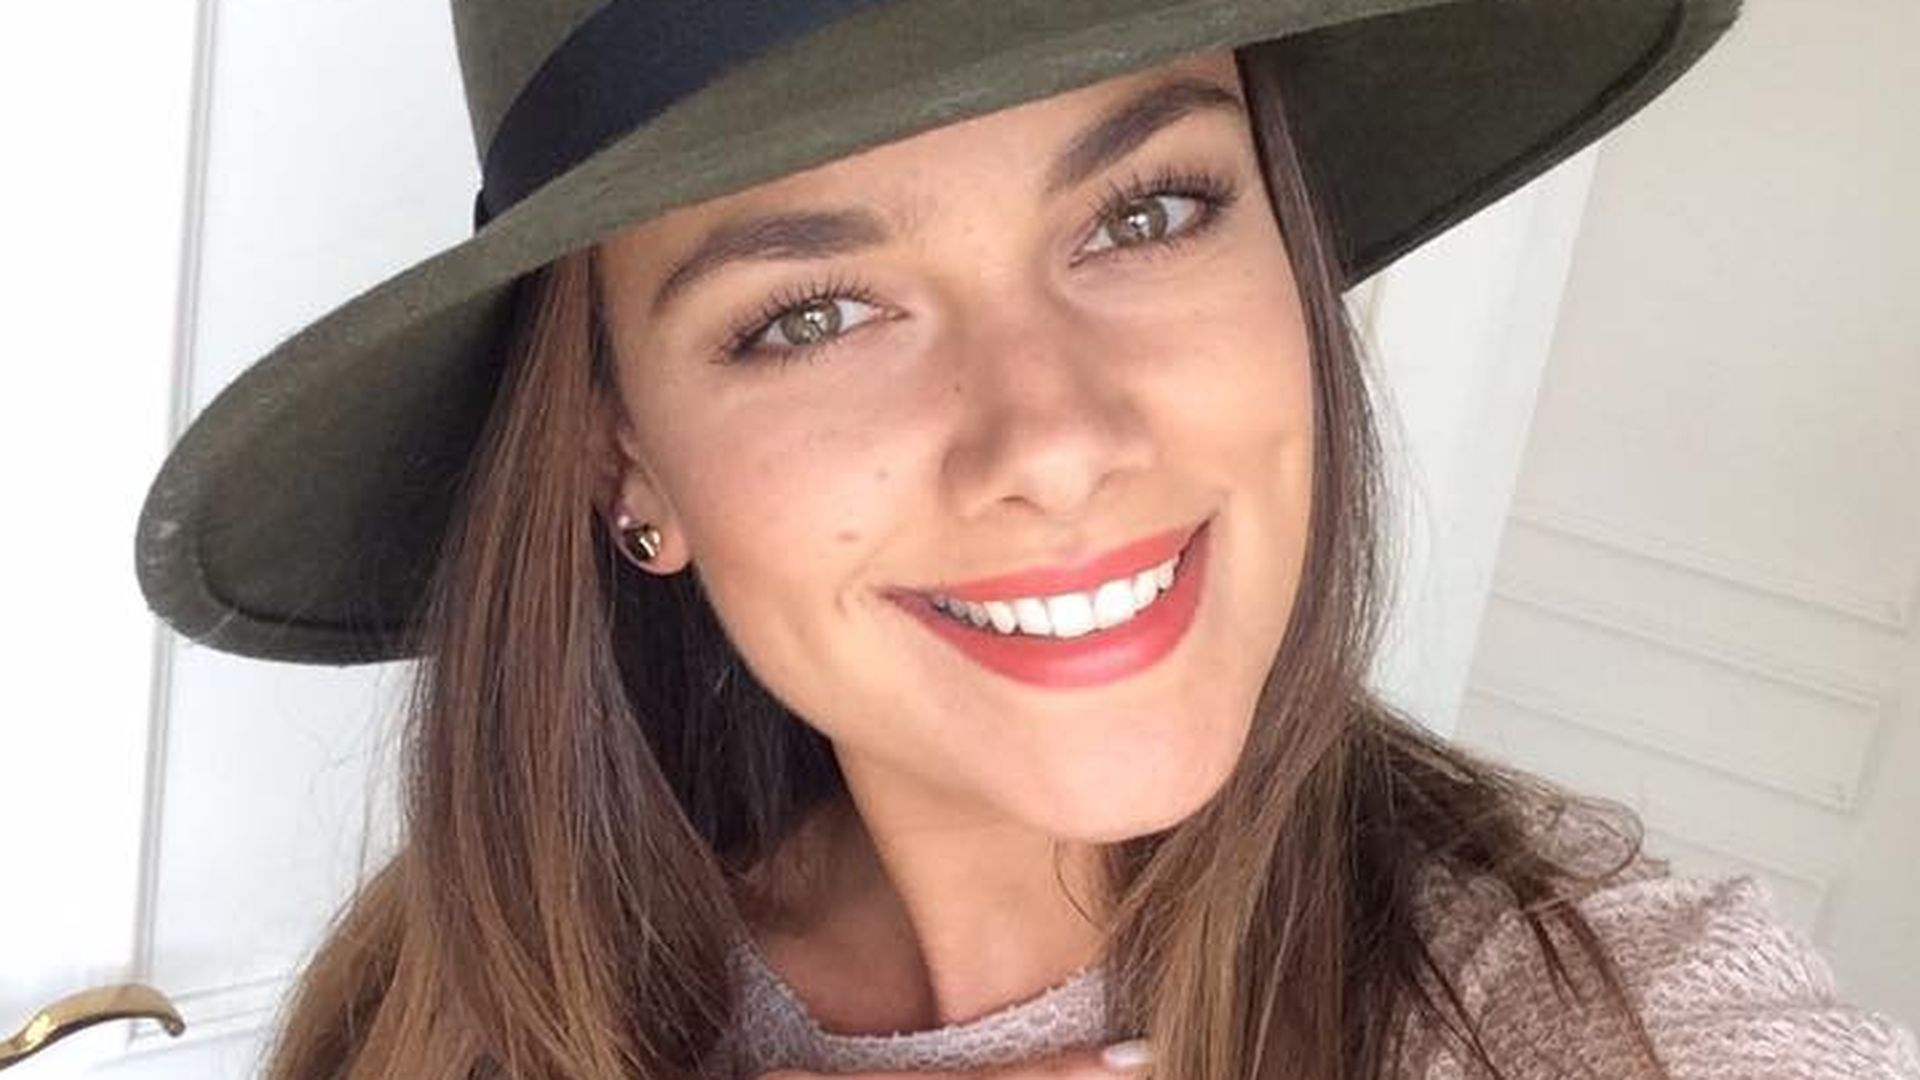 Hut Steht Ihr Gut: Janina Uhse Läutet Stylish Den Herbst